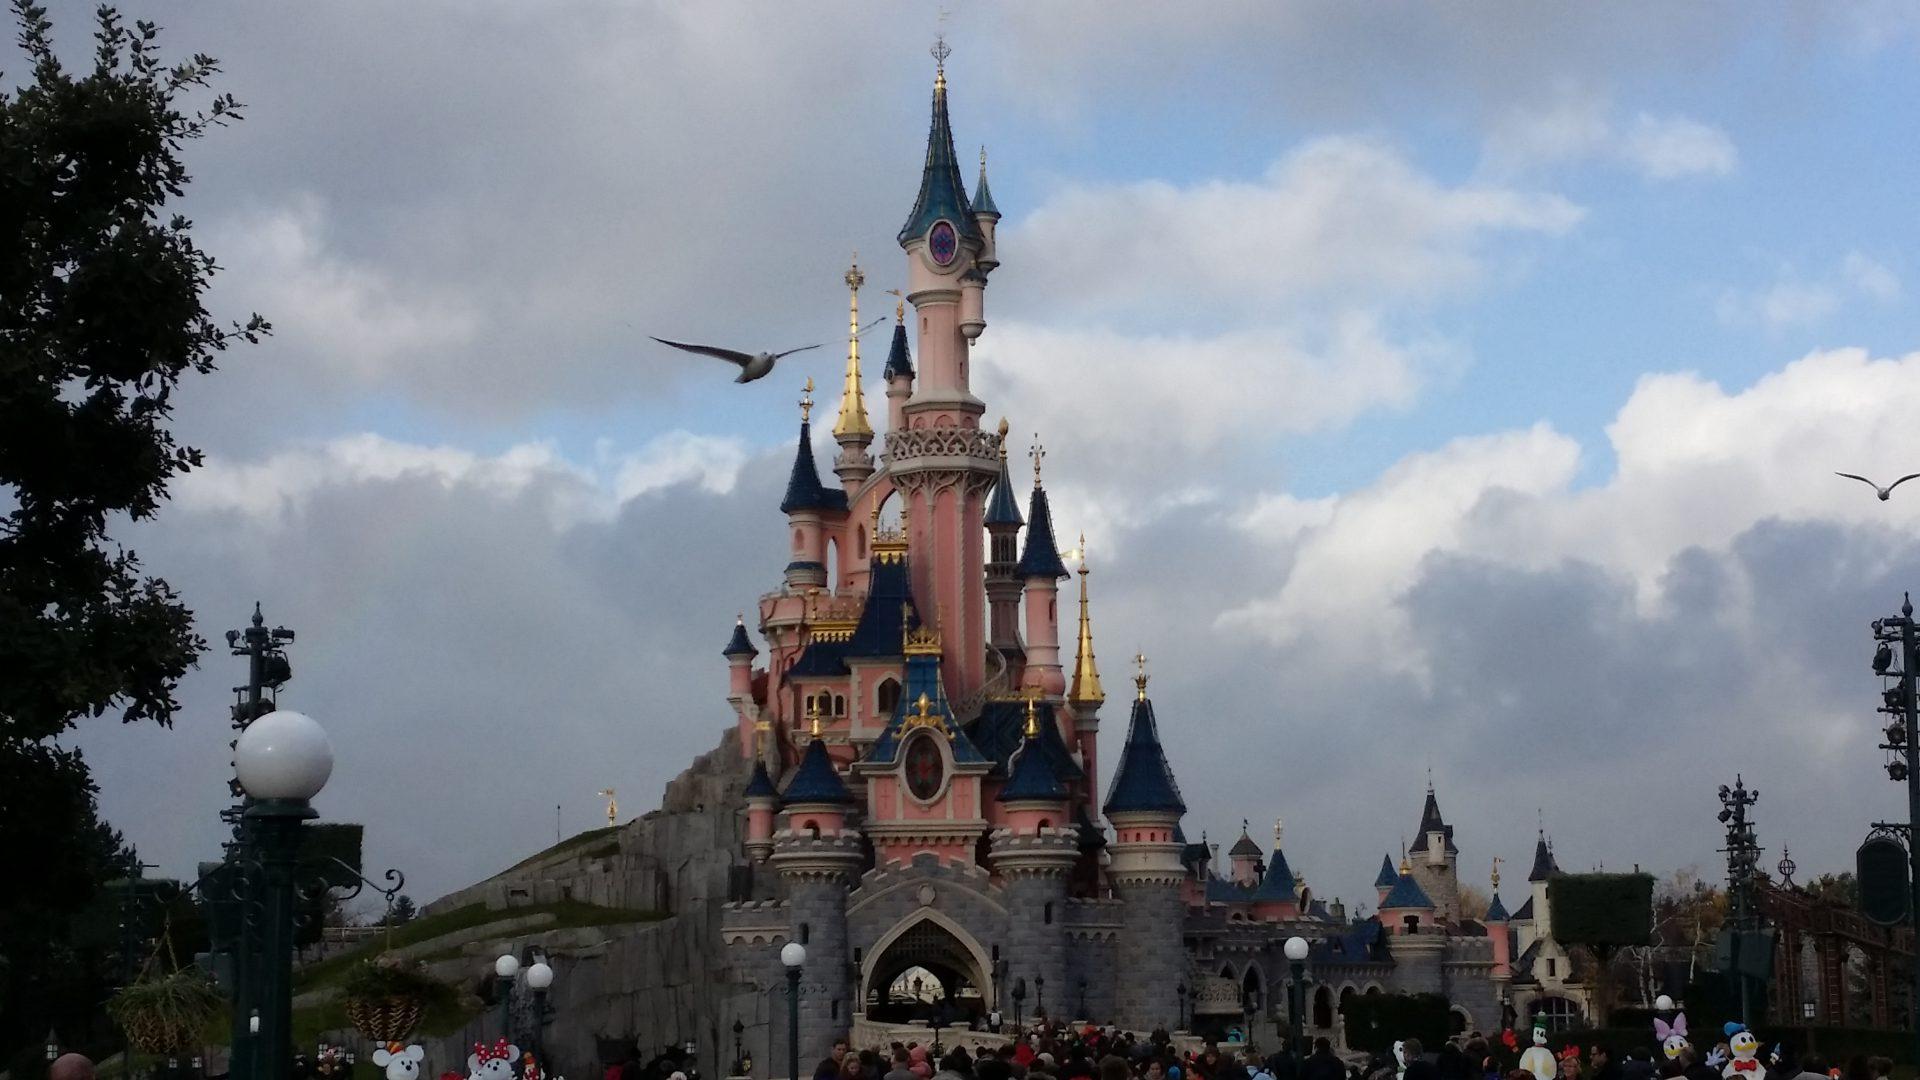 Visitare Disneyland Paris in un giorno